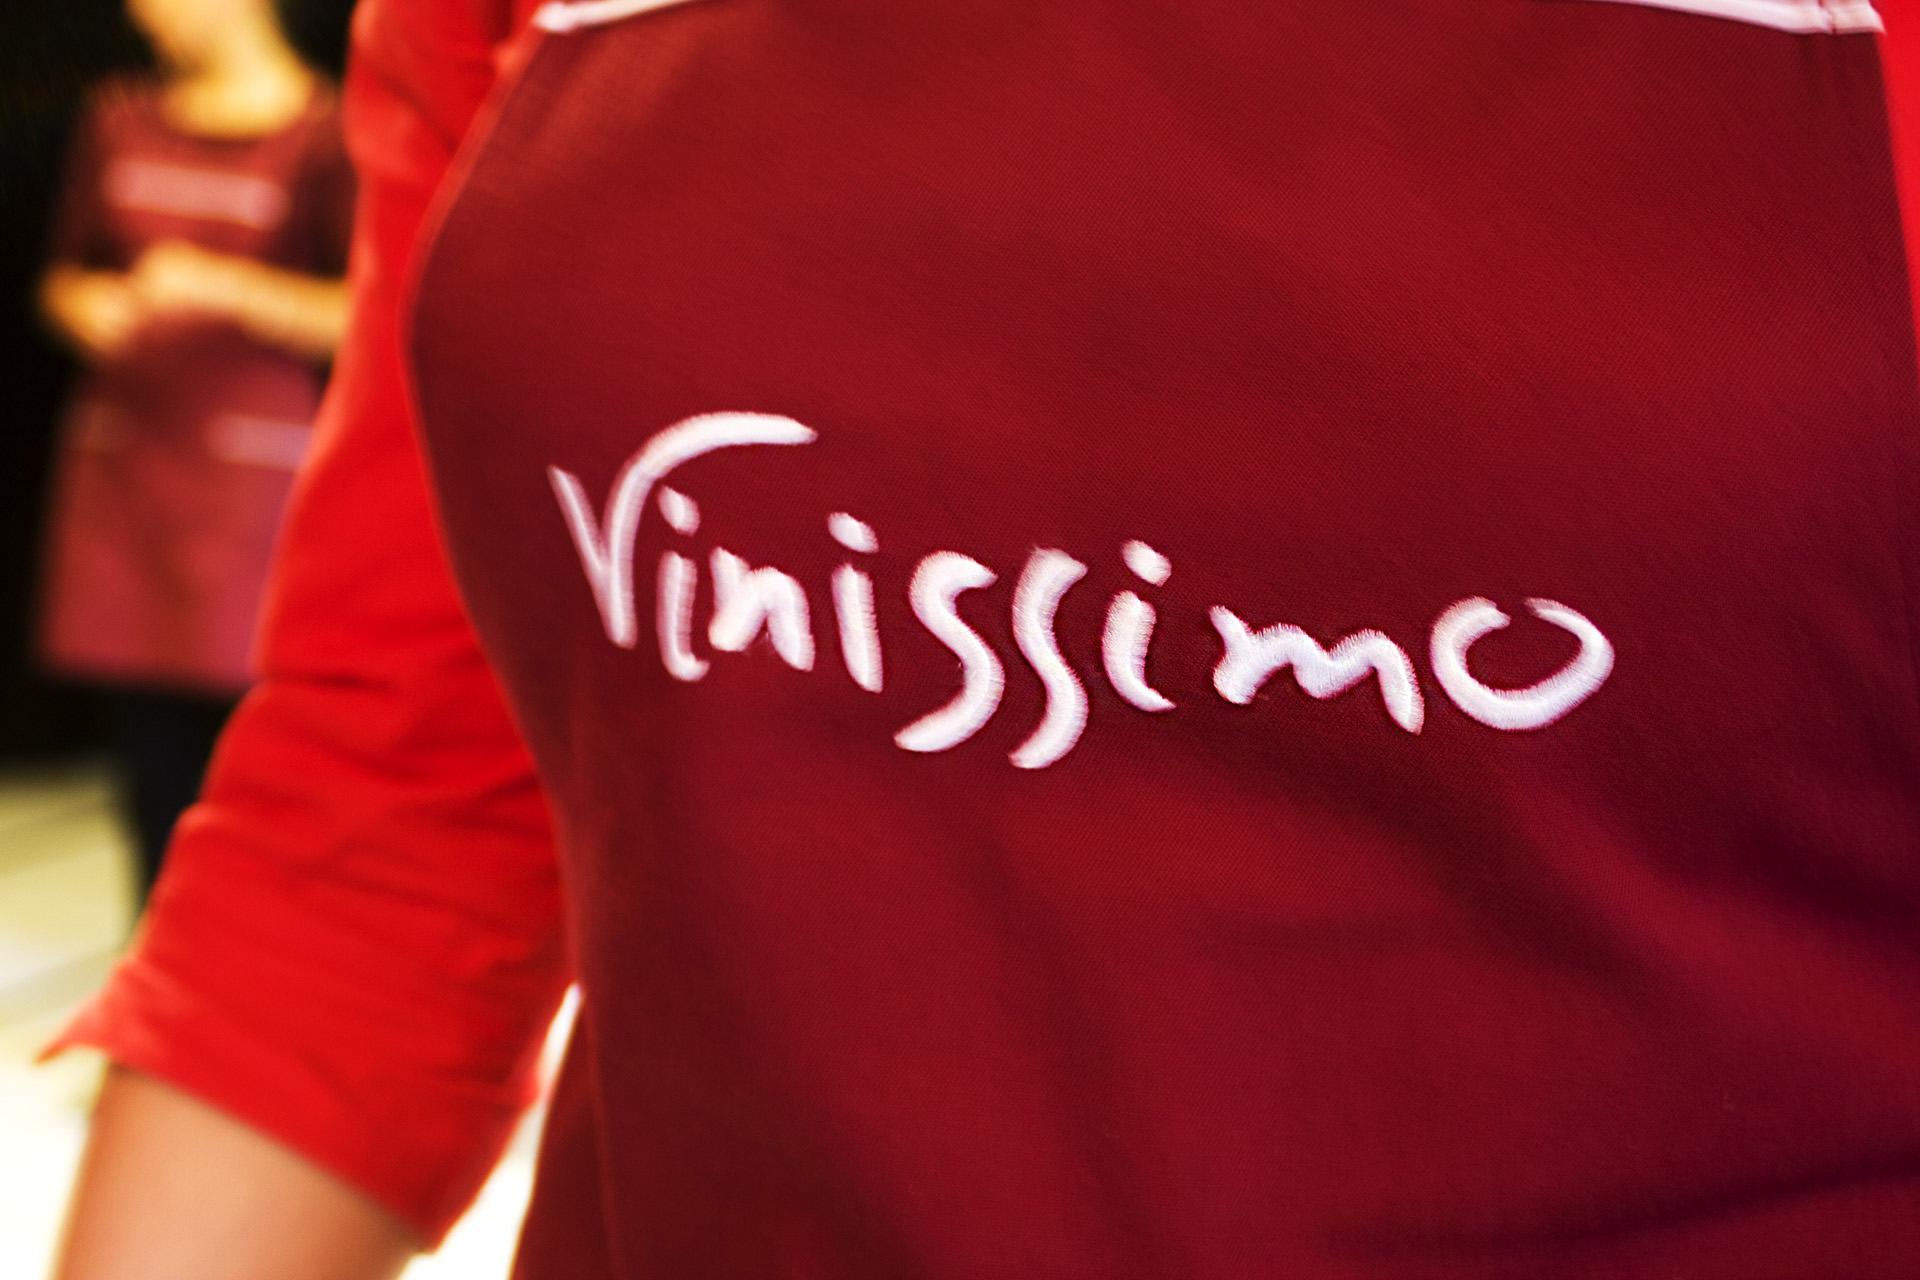 Asgard Branding, Vinissimo, corporate identity, branding, wine, logo, design, Staff uniform design